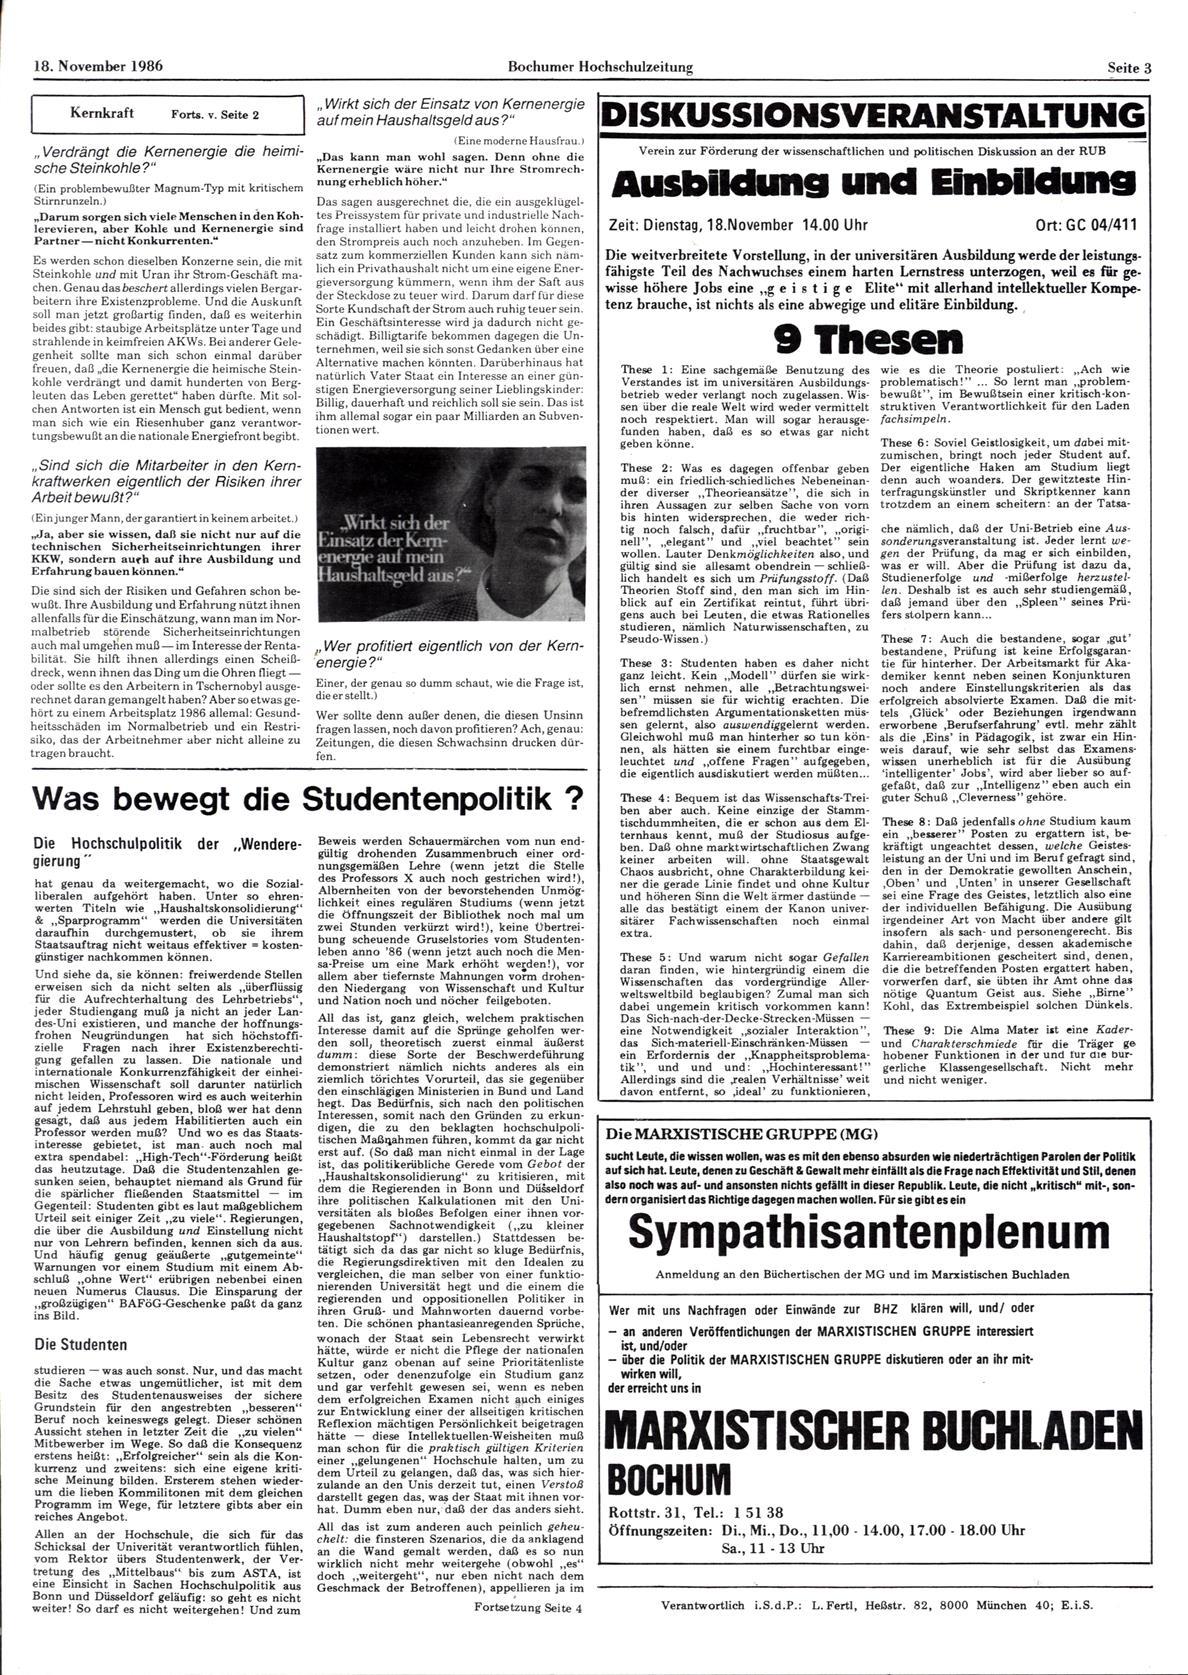 Bochum_BHZ_19861118_139_003